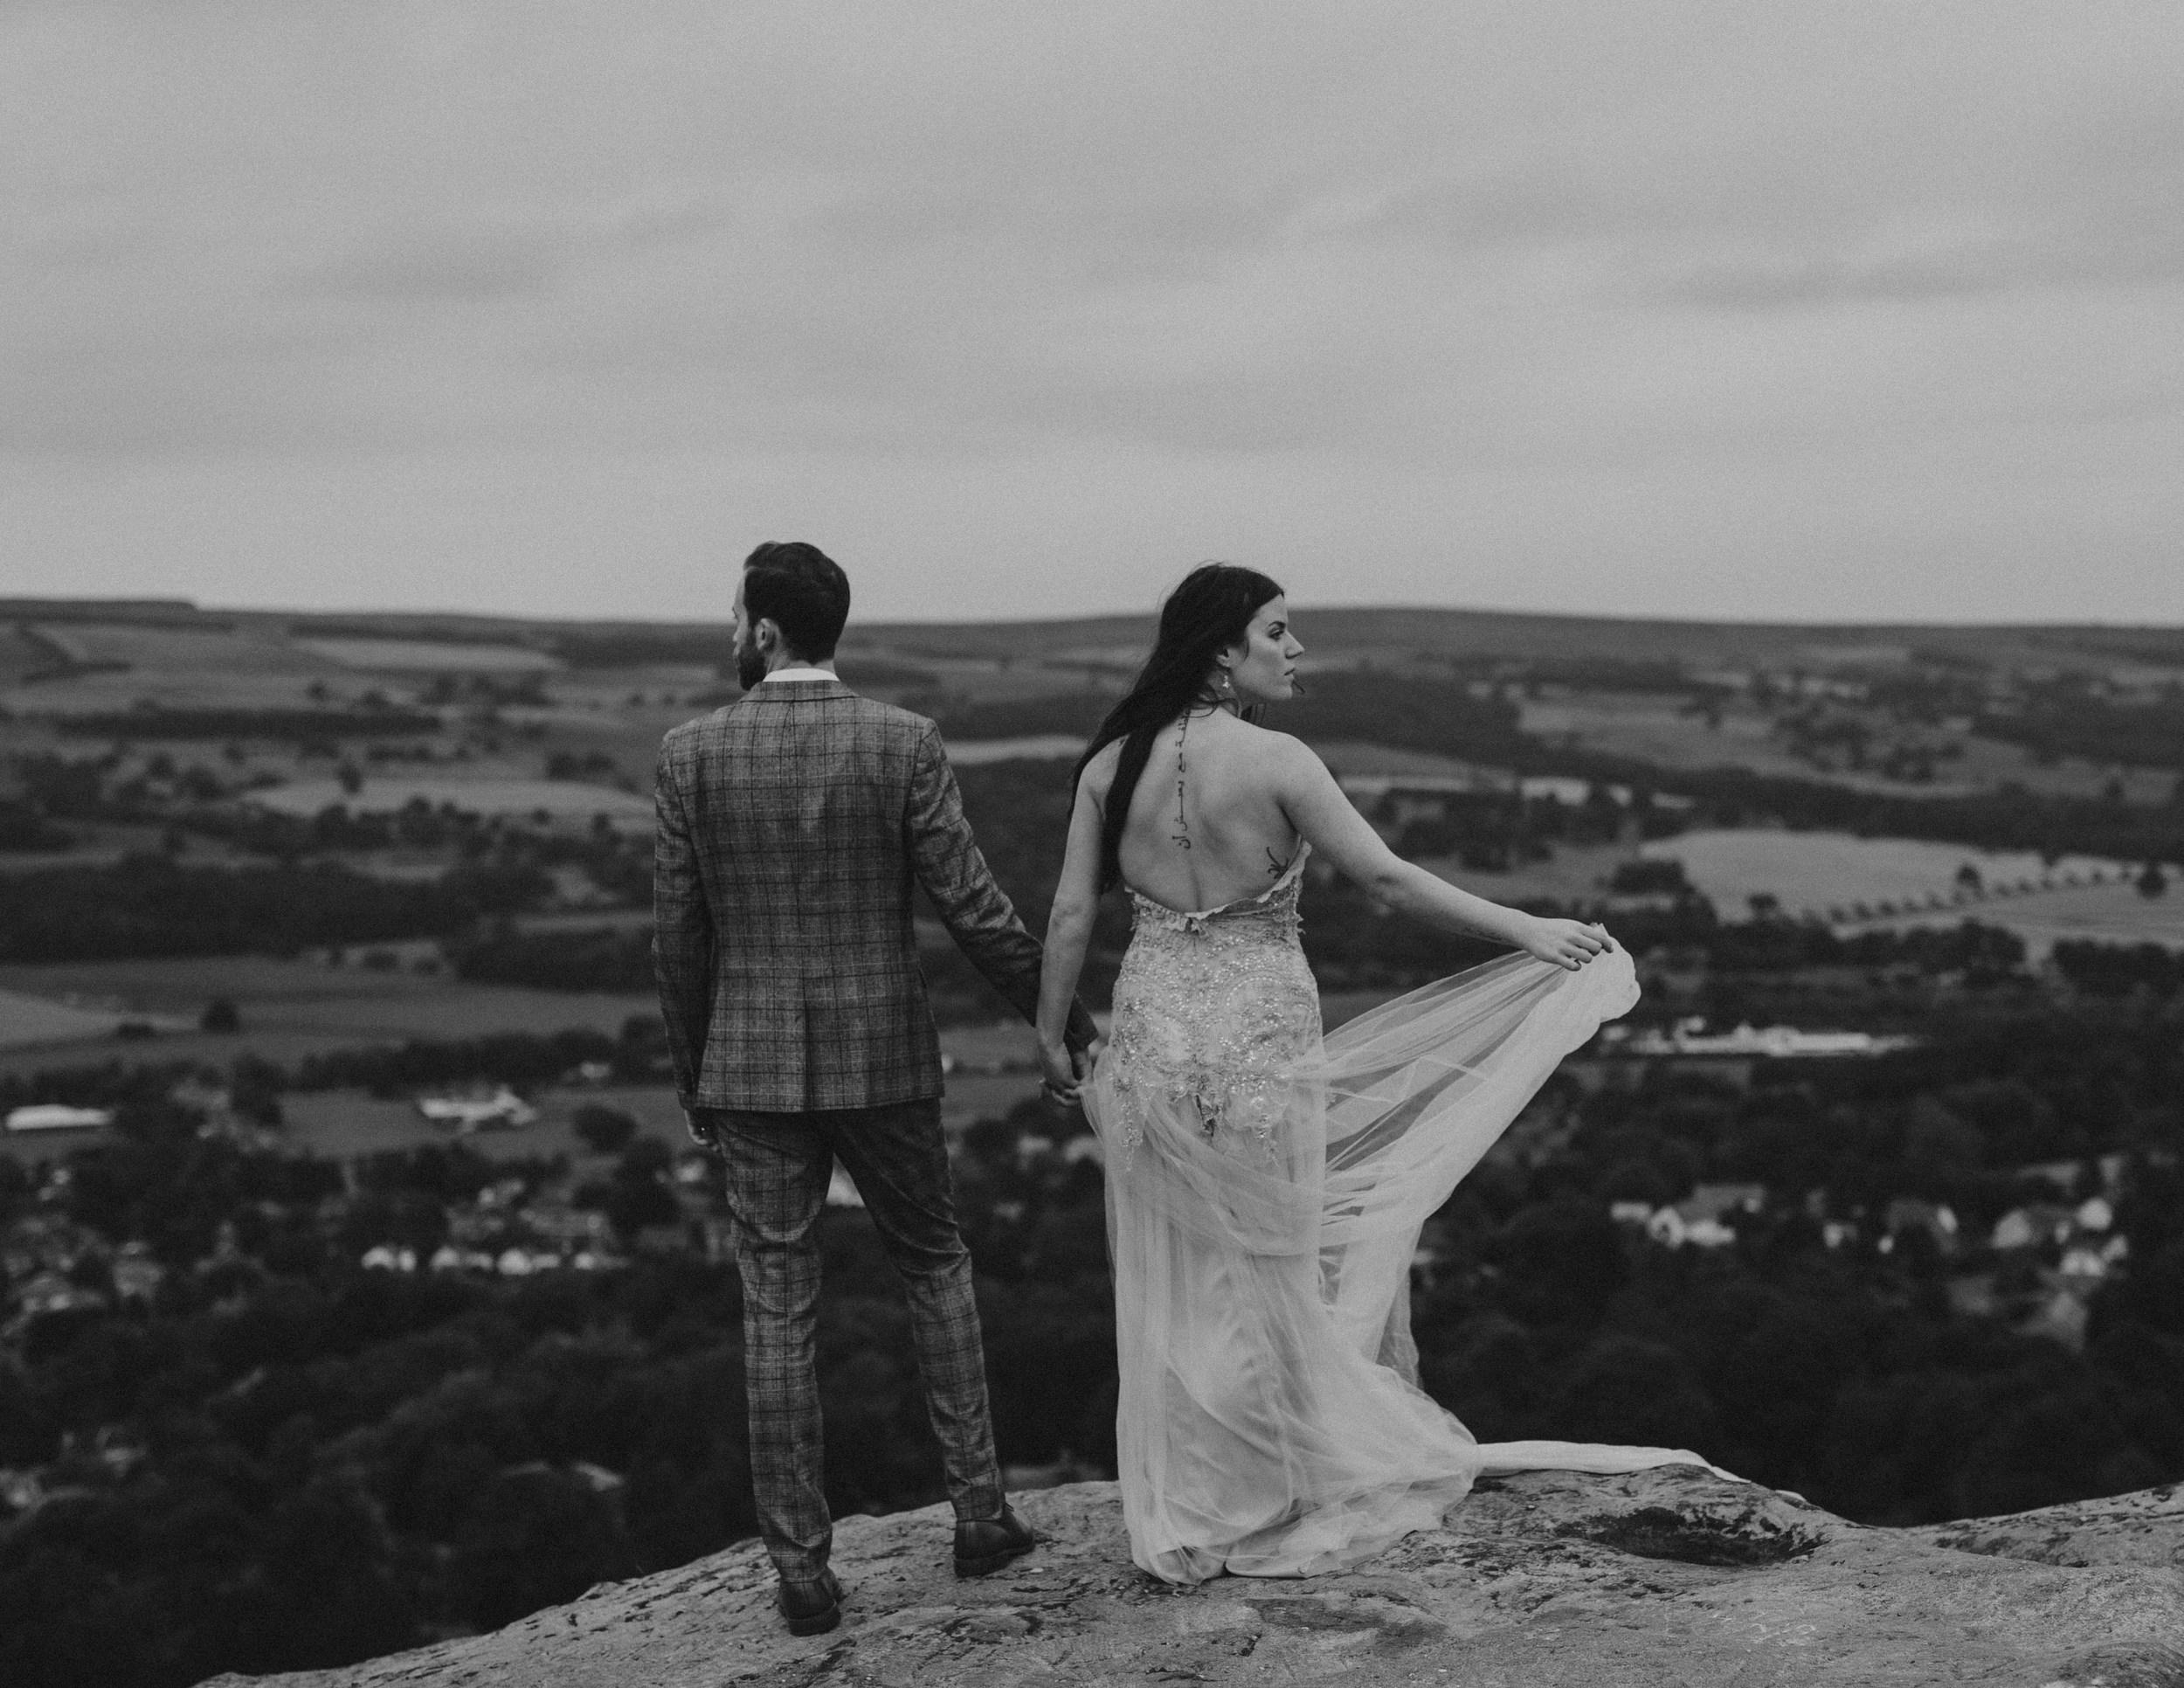 salt-lake-city-wedding-photographer-22.jpg